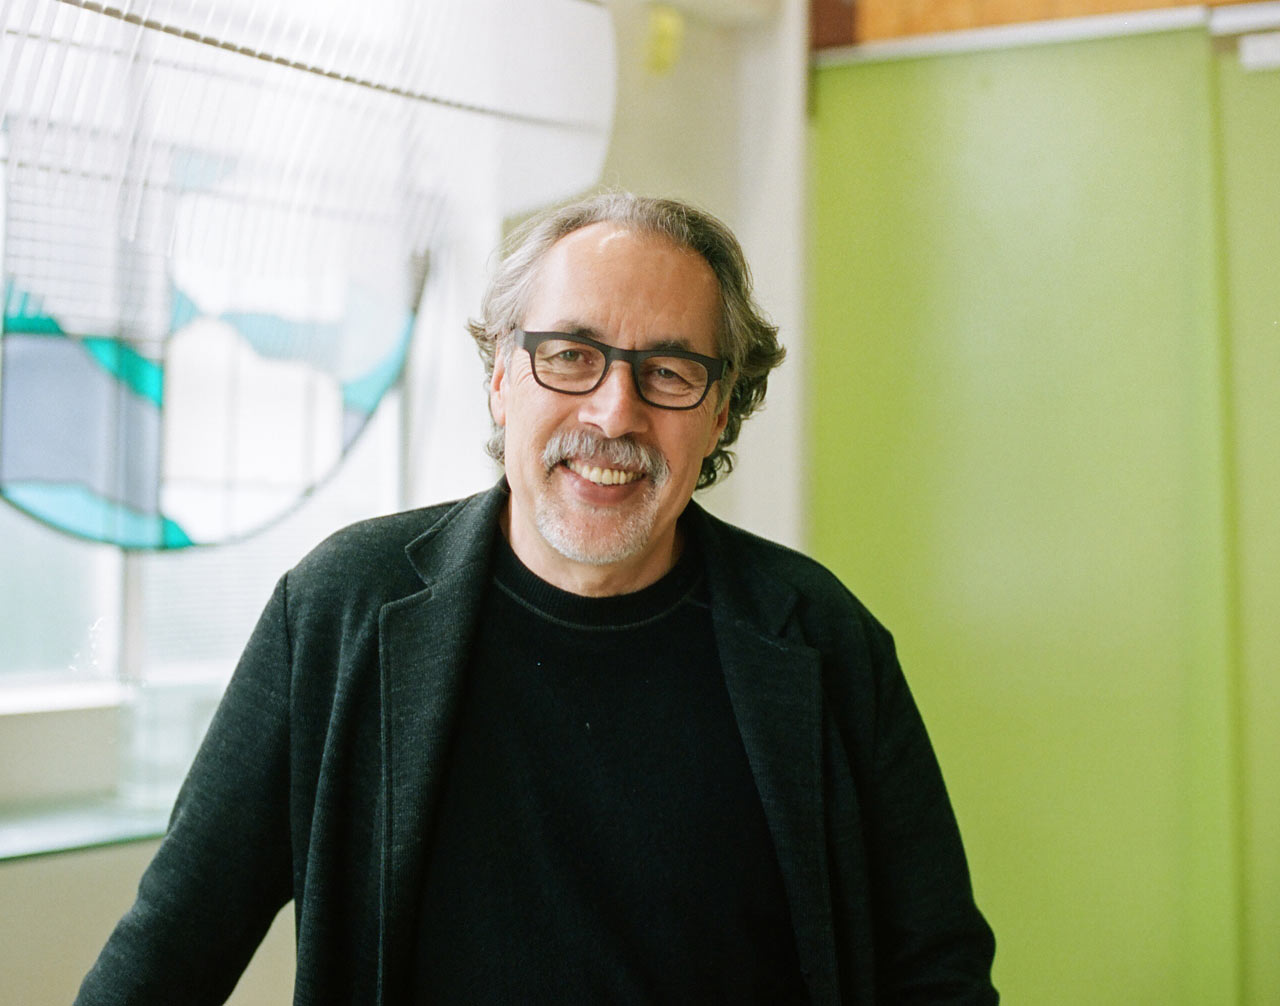 Friday Five with Joel Berman